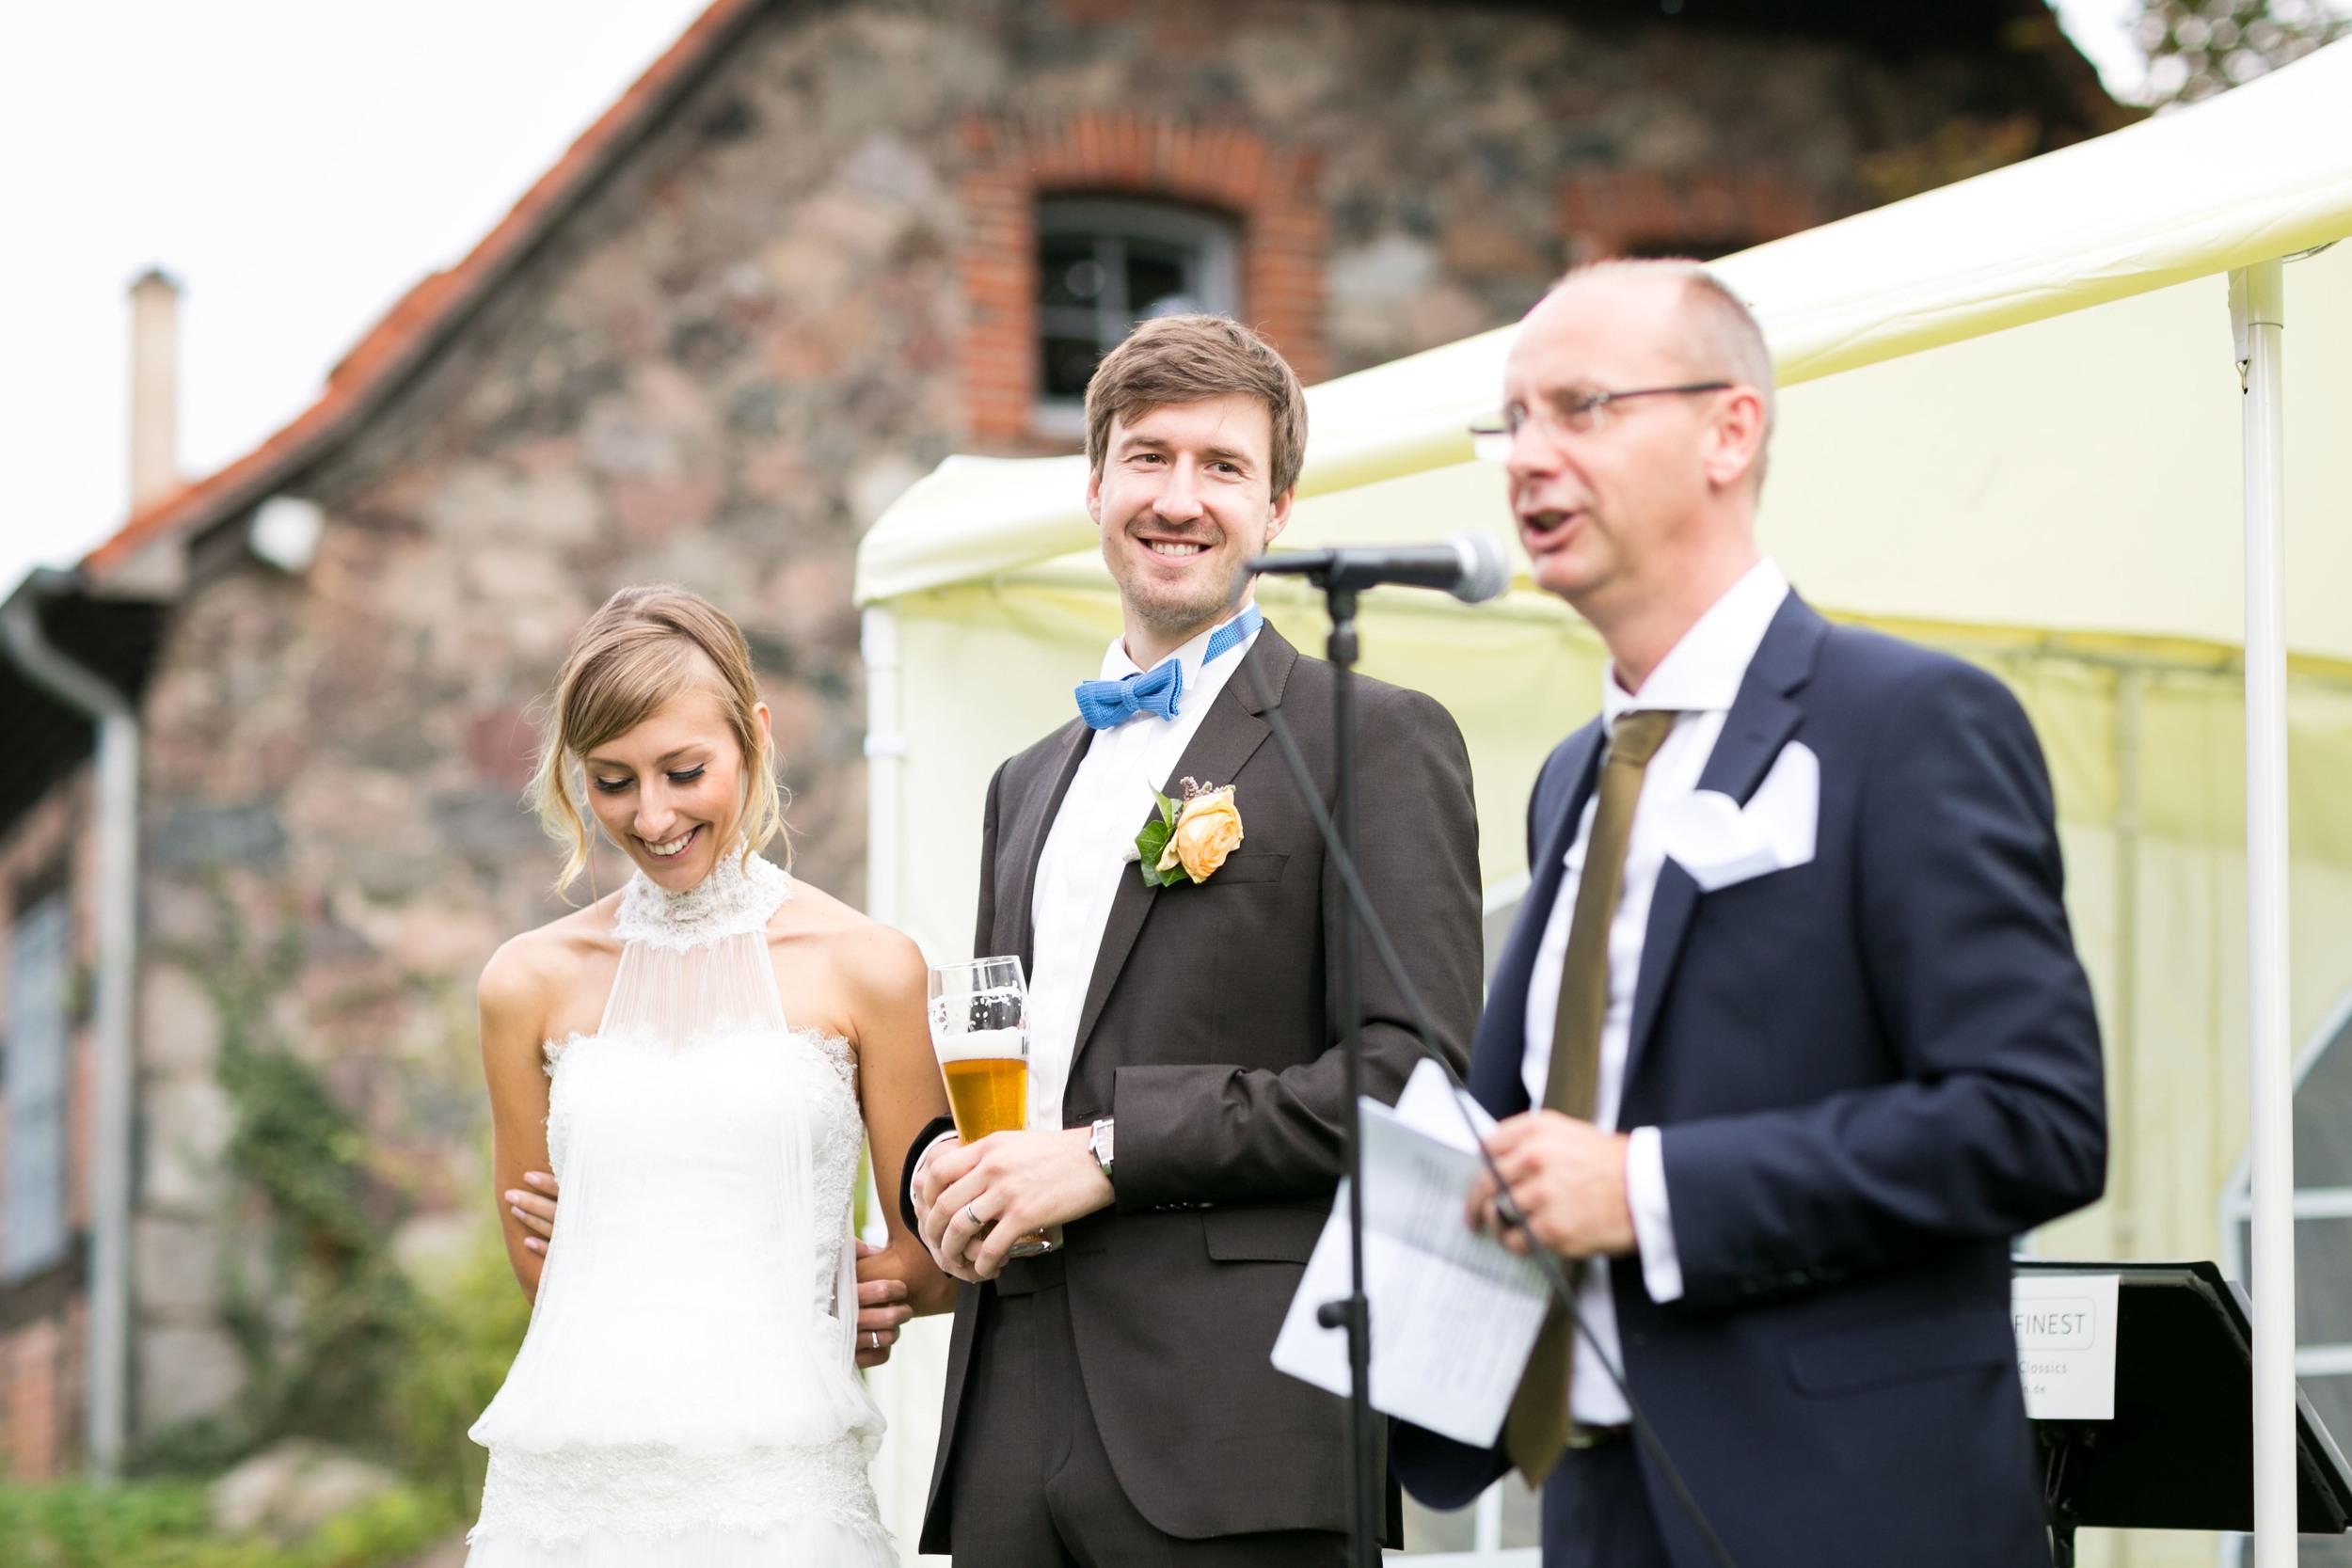 Fran Burrows Hochzeitsfotografie_Kulturgut Wrechen Hochzeit-50.jpg